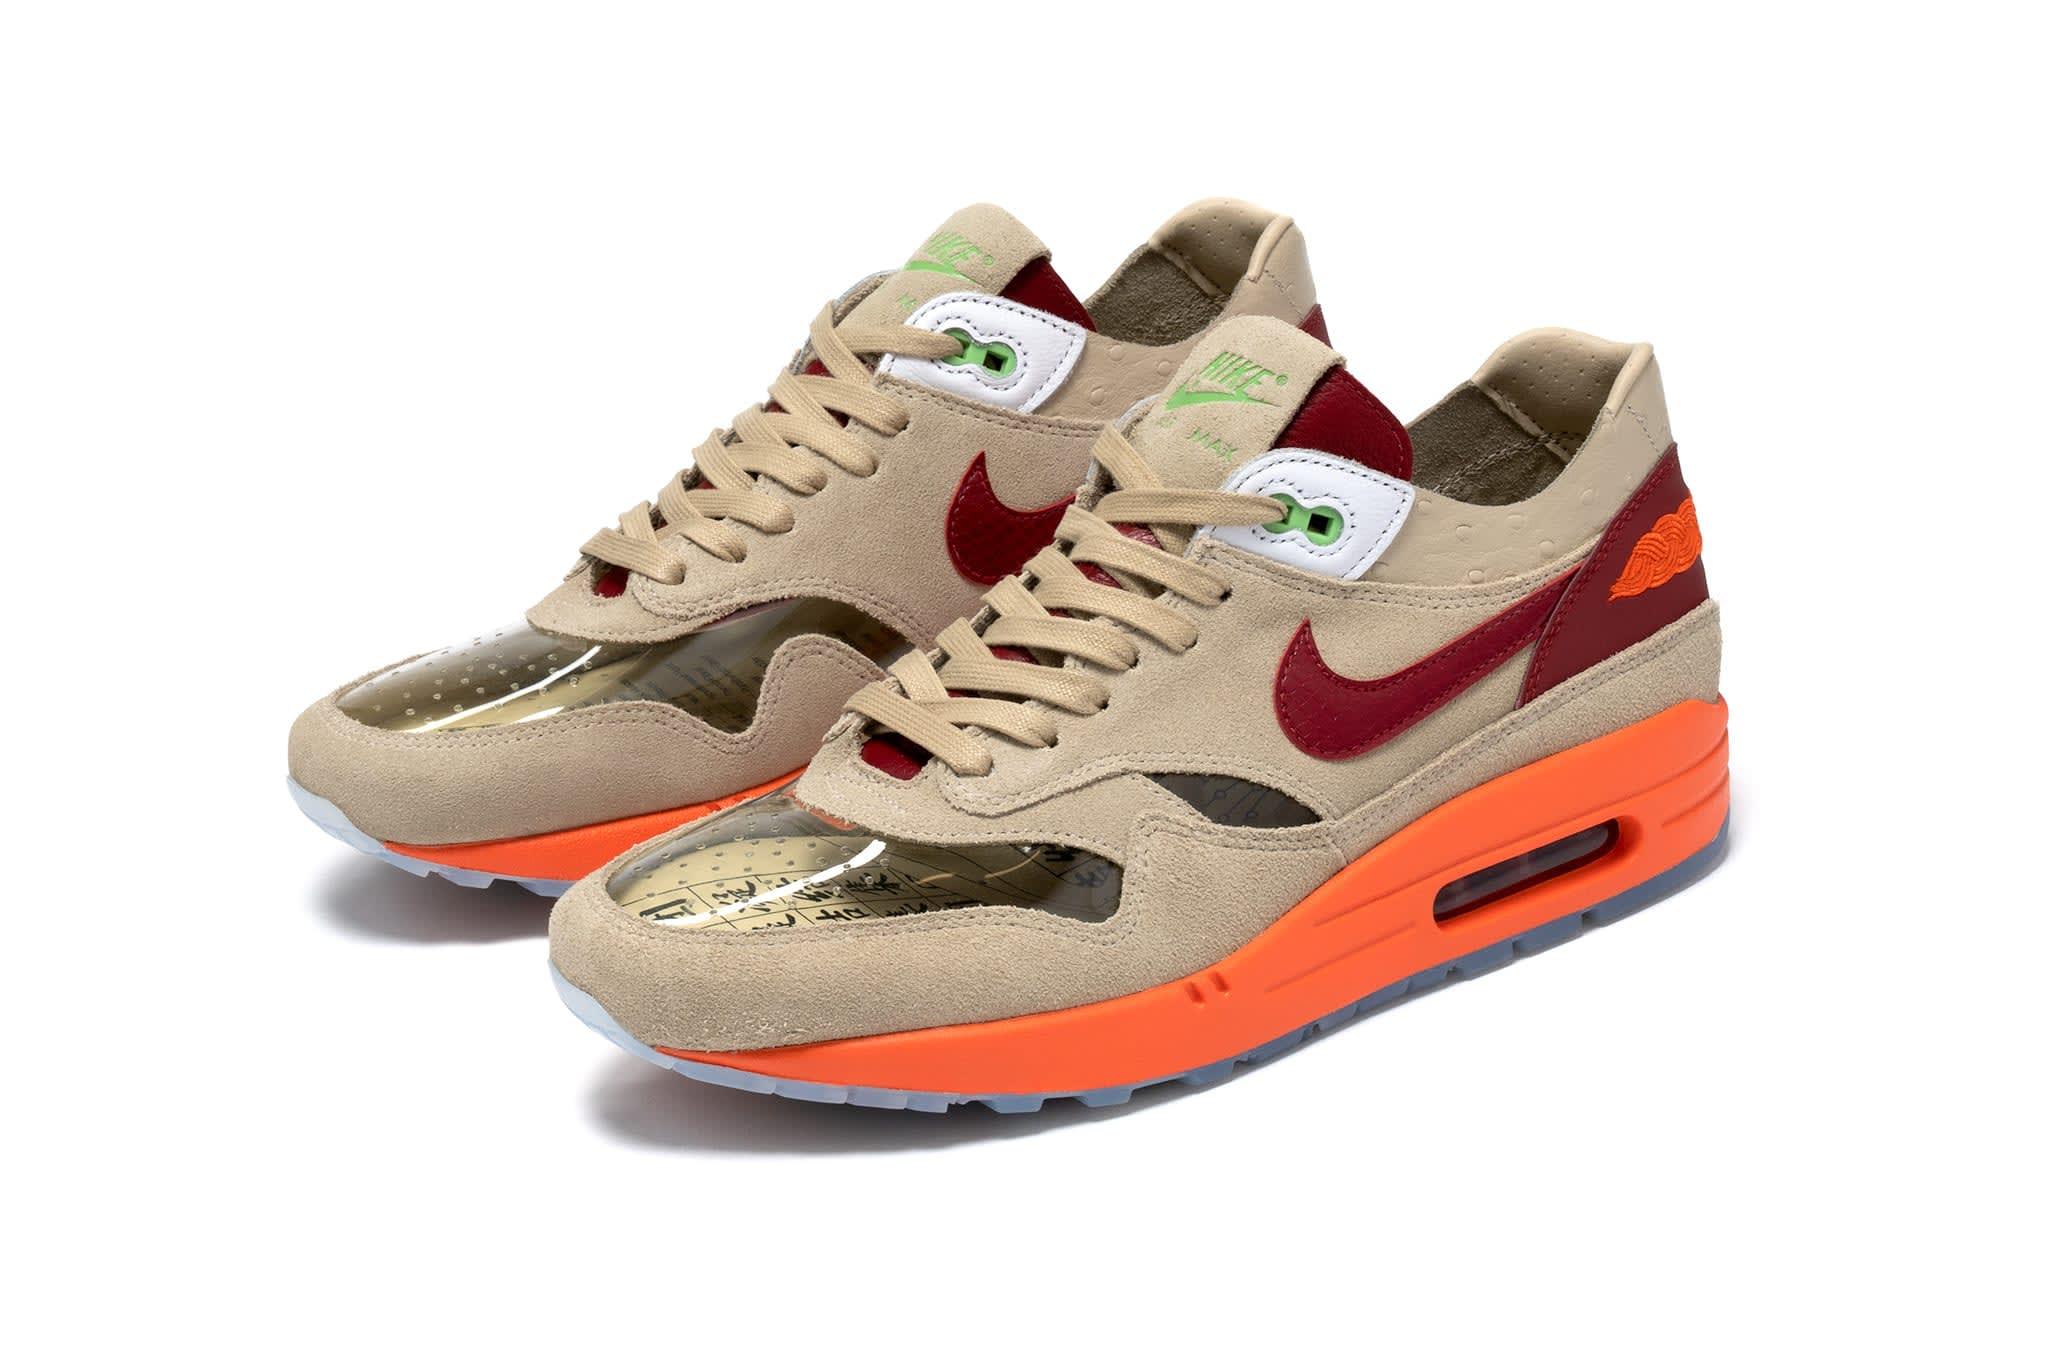 Nike x CLOT Air Max 1 | Release Date: 03.27.21 | HAVEN